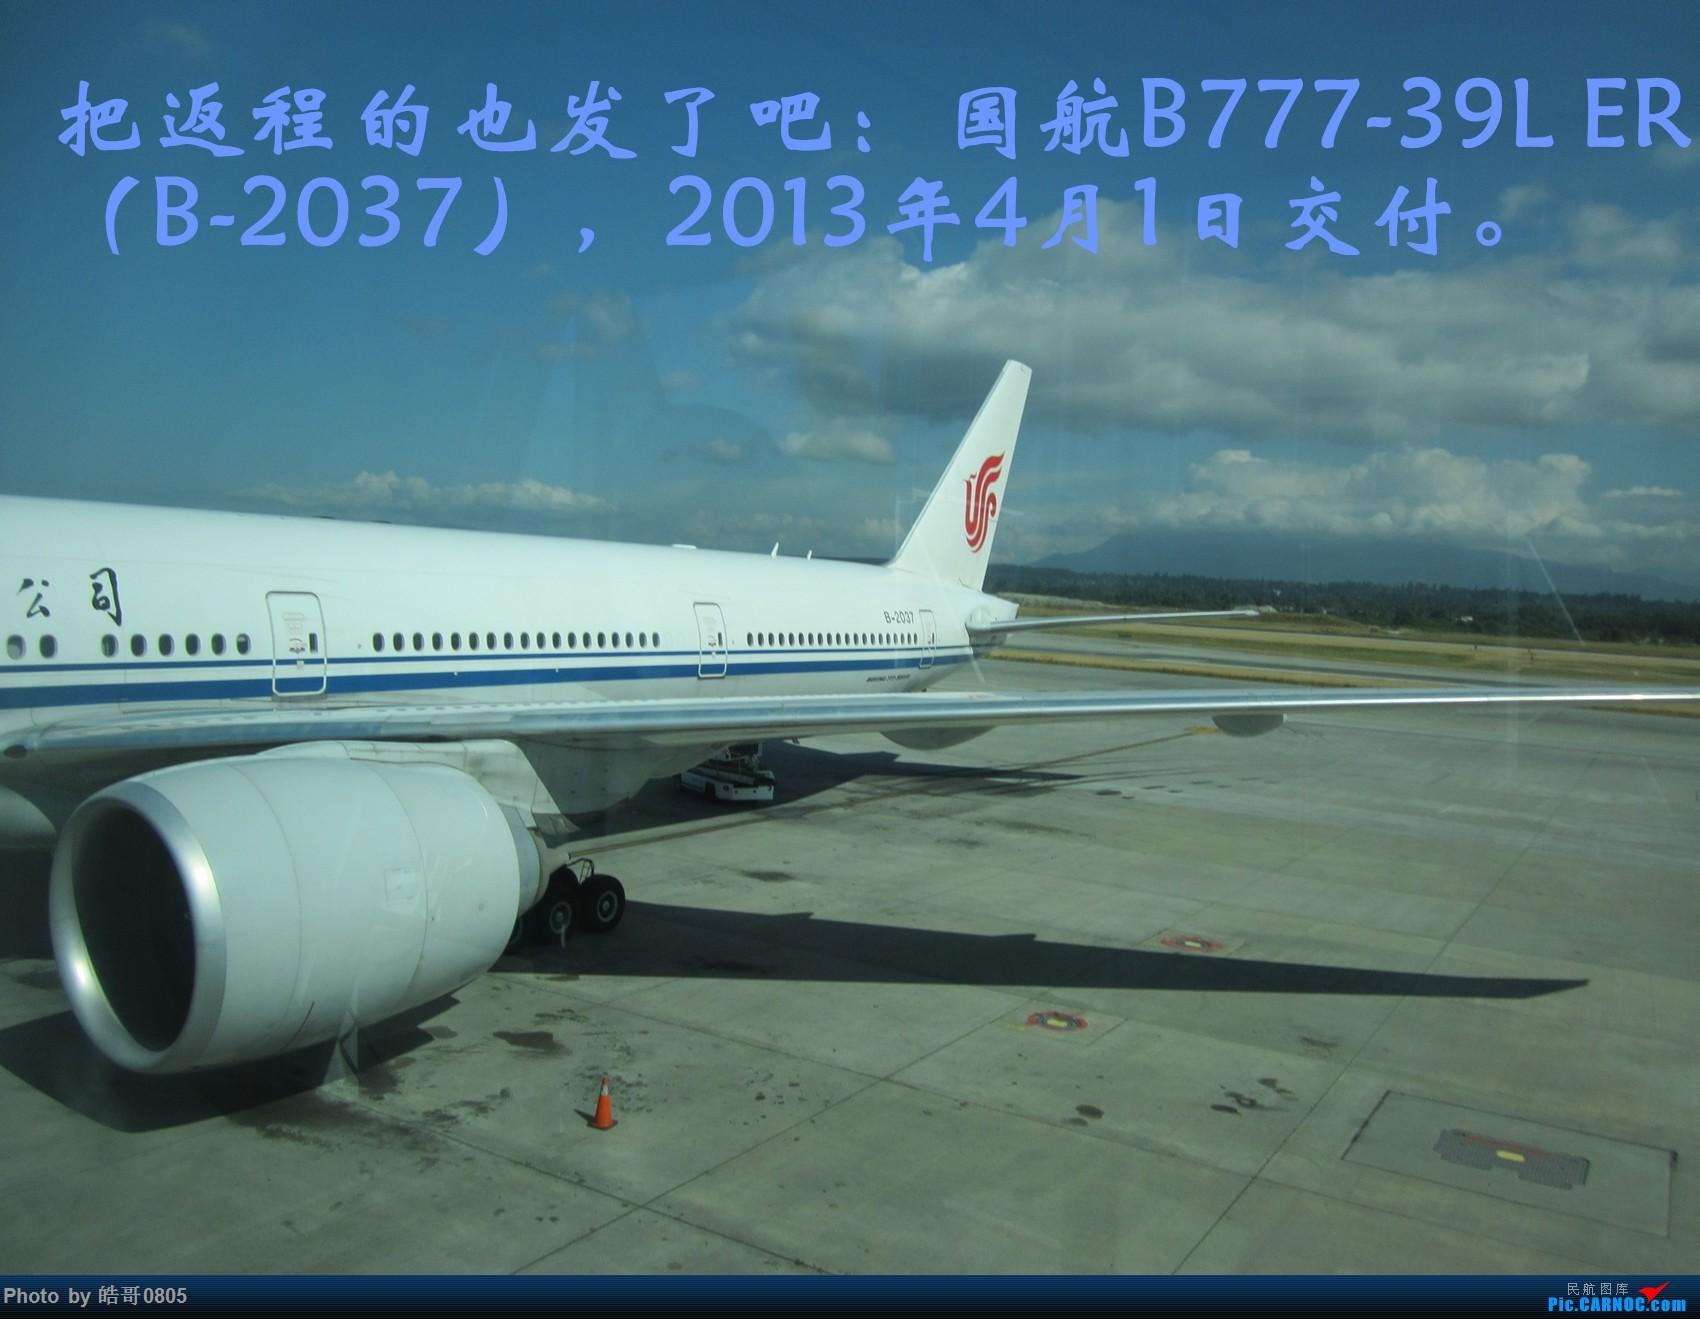 Re:第一次发图,还望多多关照 BOEING 777-300ER B-2037 加拿大温哥华机场